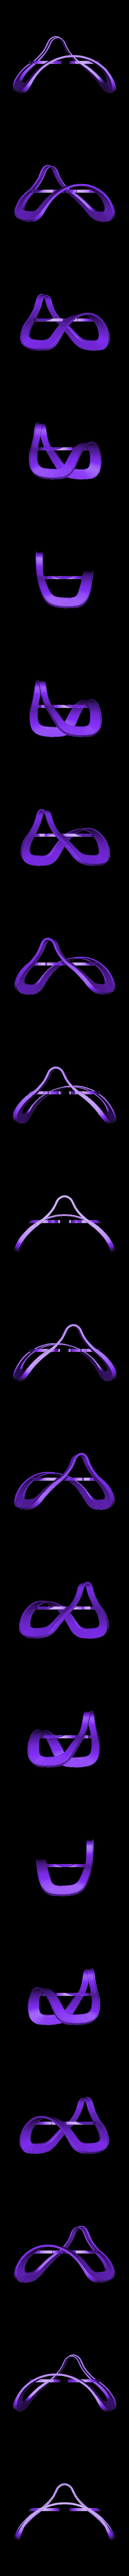 Pimax_or_lens_mount_64-190509-full_spacer.stl Download free 3MF file Pimax 5k/8k - Lens Lab Rift lenses mount - update 190509 • 3D printing object, Ziddan